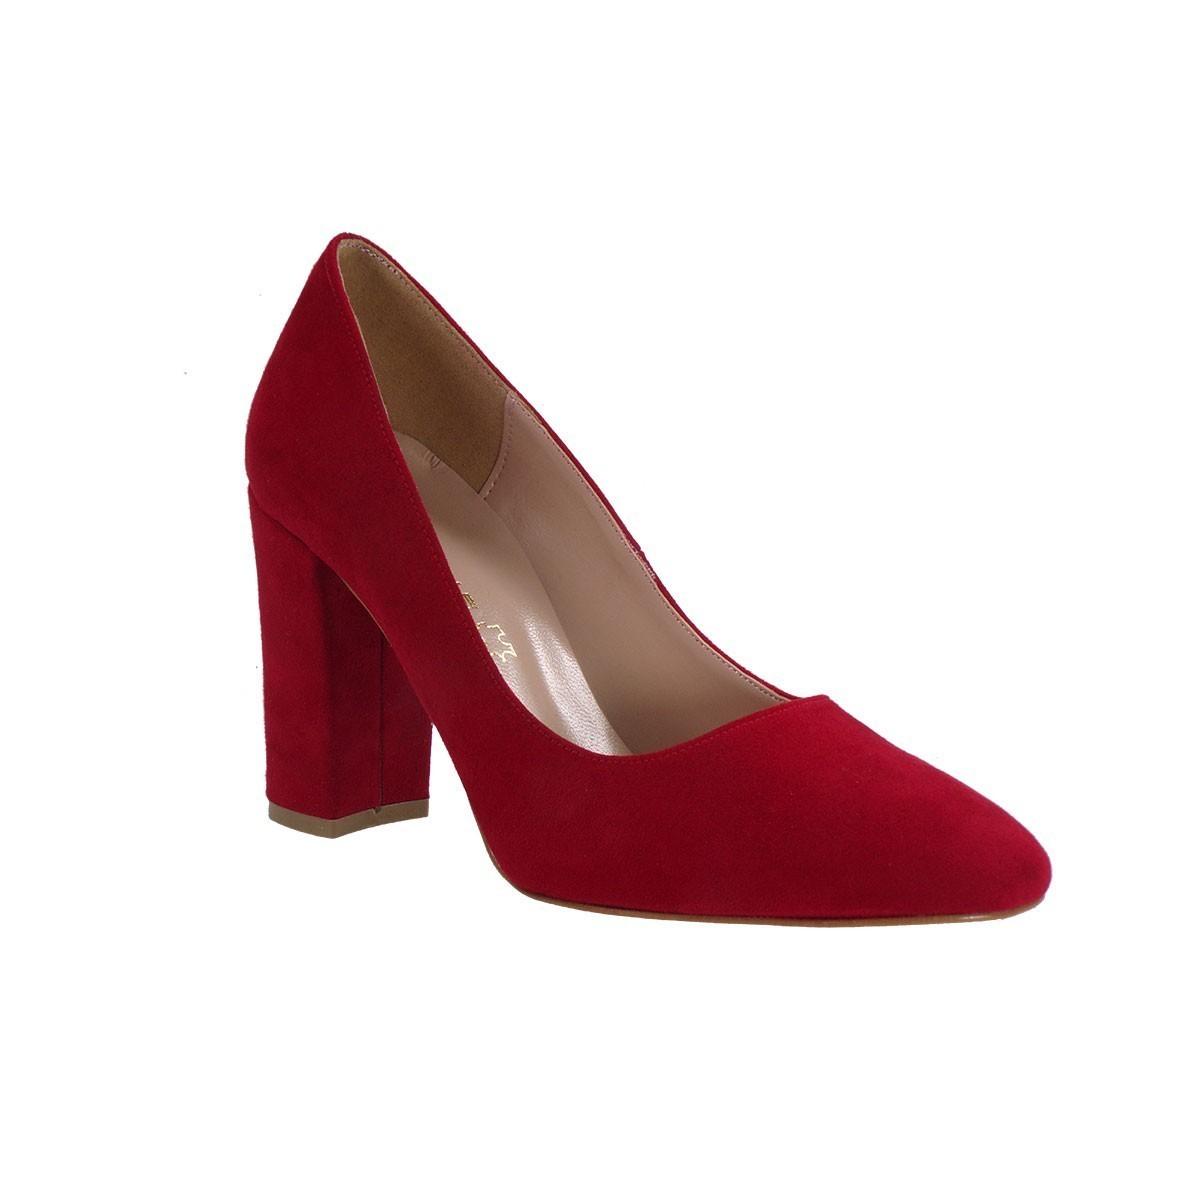 Envie Shoes Γυναικείες Παπούτσια Γόβες E02-07415 Κόκκινο Καστόρι